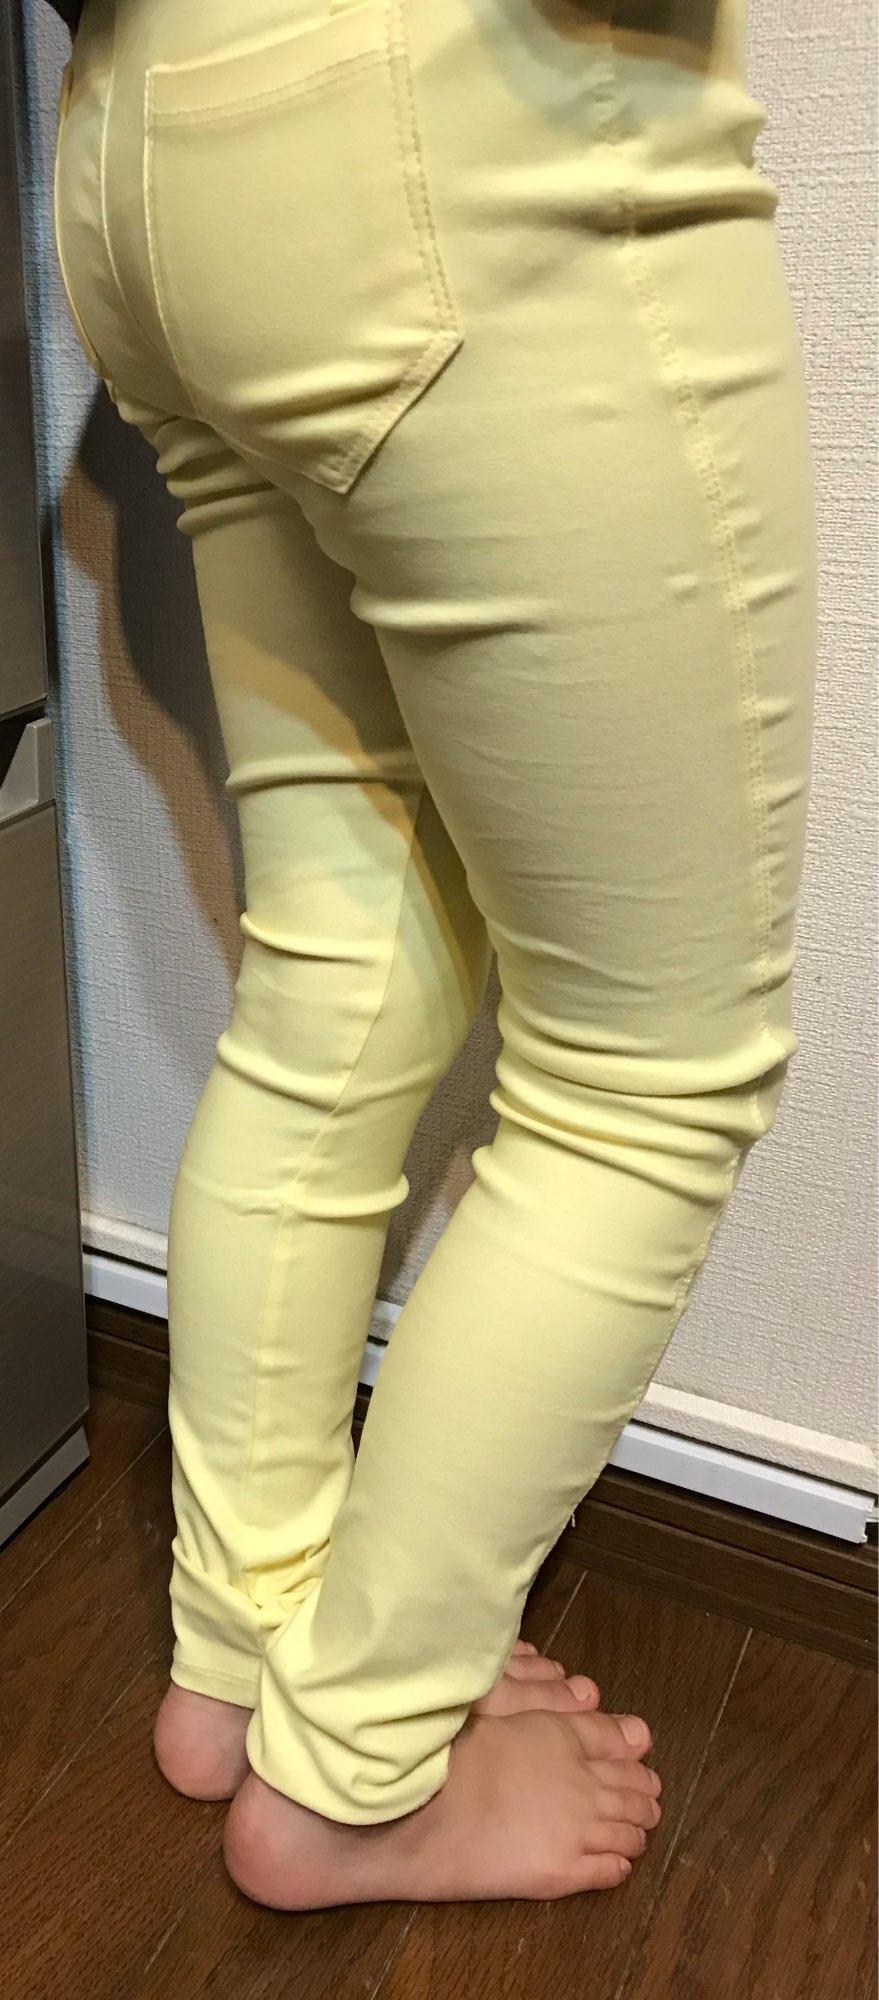 VEENIBEAR Spring Summer Girl Pants Candy Color Cotton Girl Leggings Children Kids Pants Slim Pencil Pants For Girl Age 3 9T|Pants|   - AliExpress